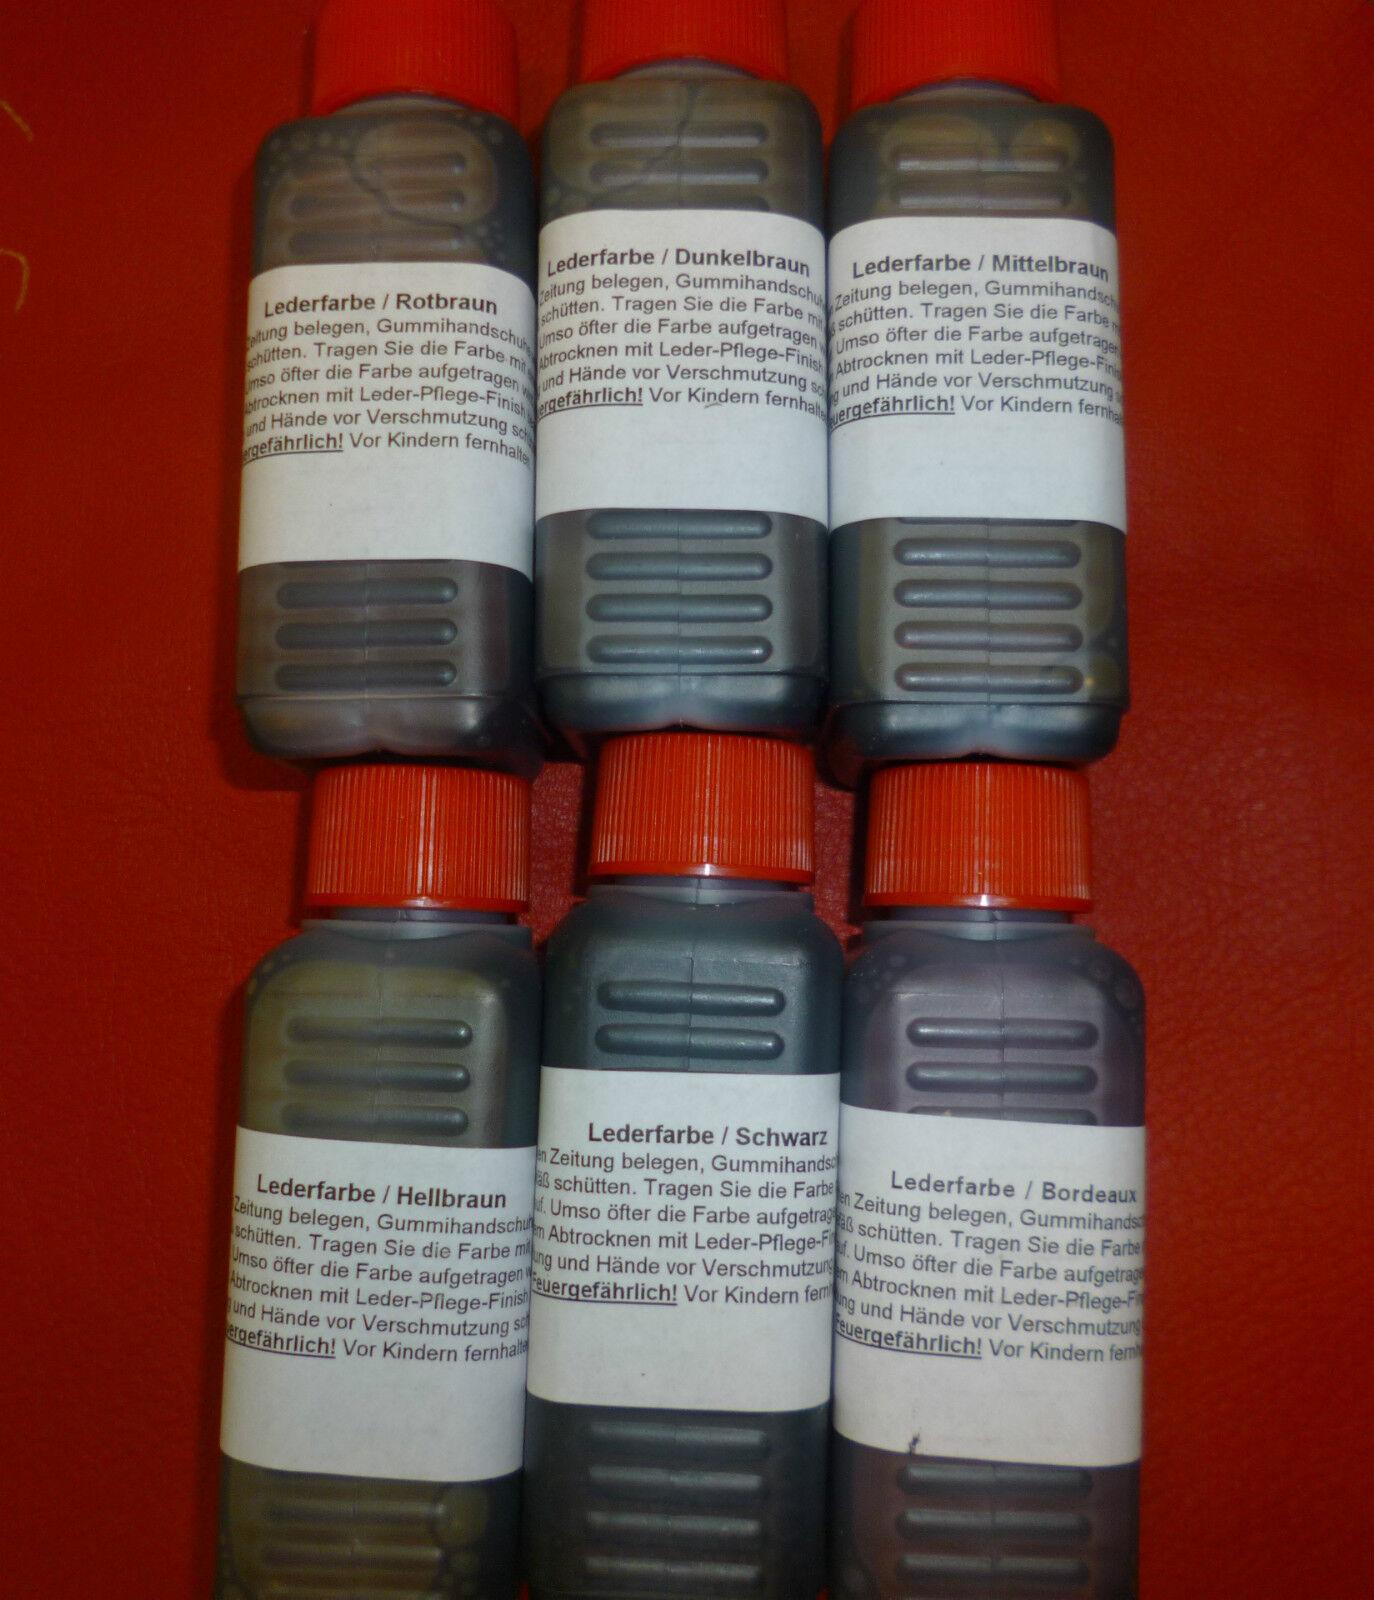 Lederfarbe Lederbeize wie Fiebings leather dye 6 verschiedene Farben erhältlich